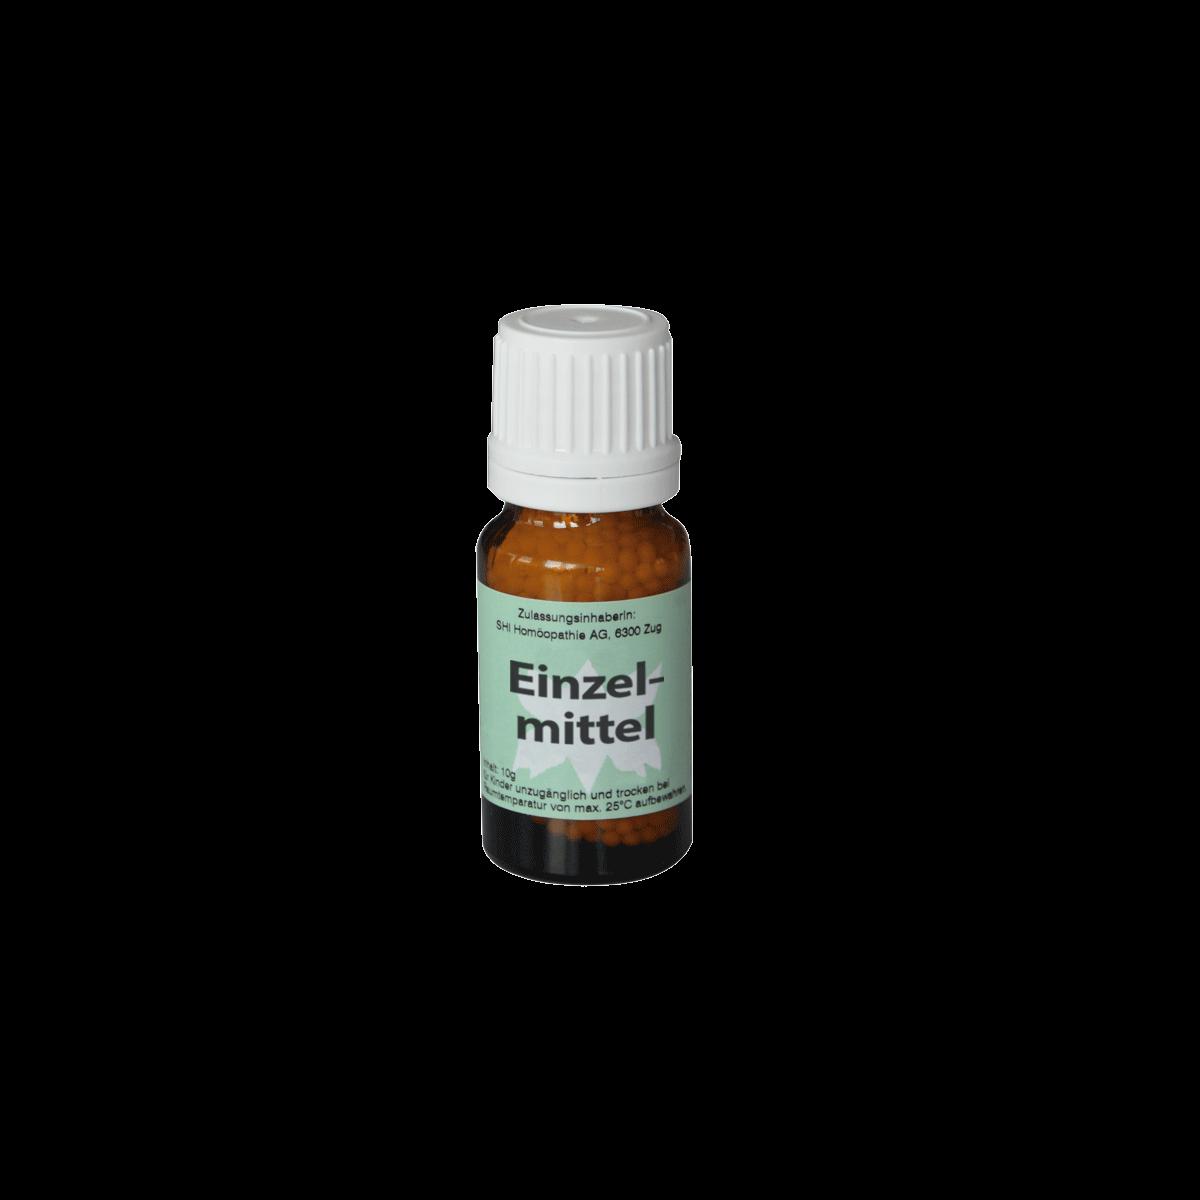 Acidum butyricum